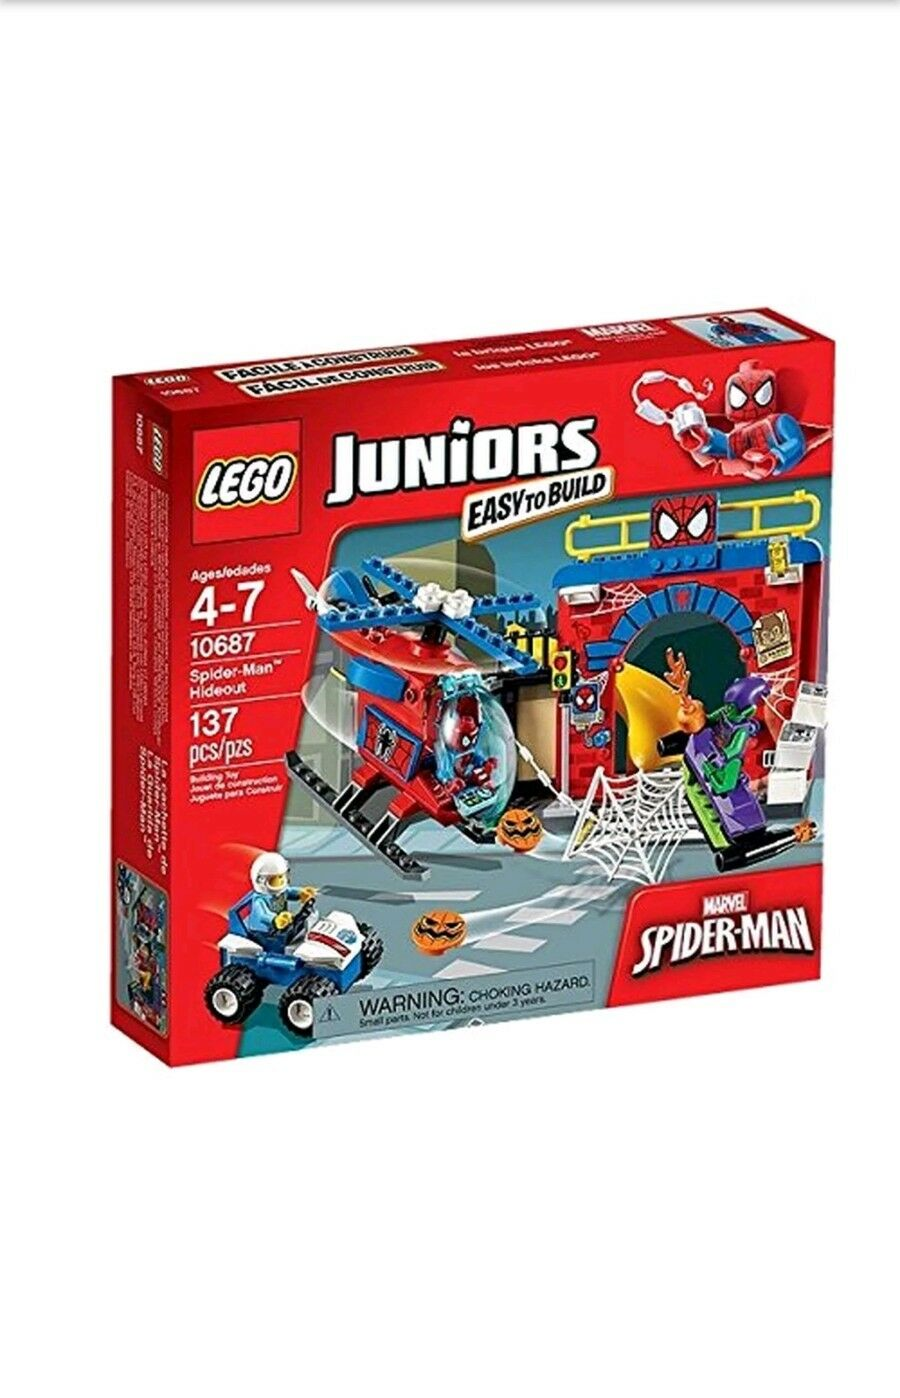 LEGO 10687 Juniors Marvel Spider-Man Hideout and Grün Goblin Set BRAND NEW